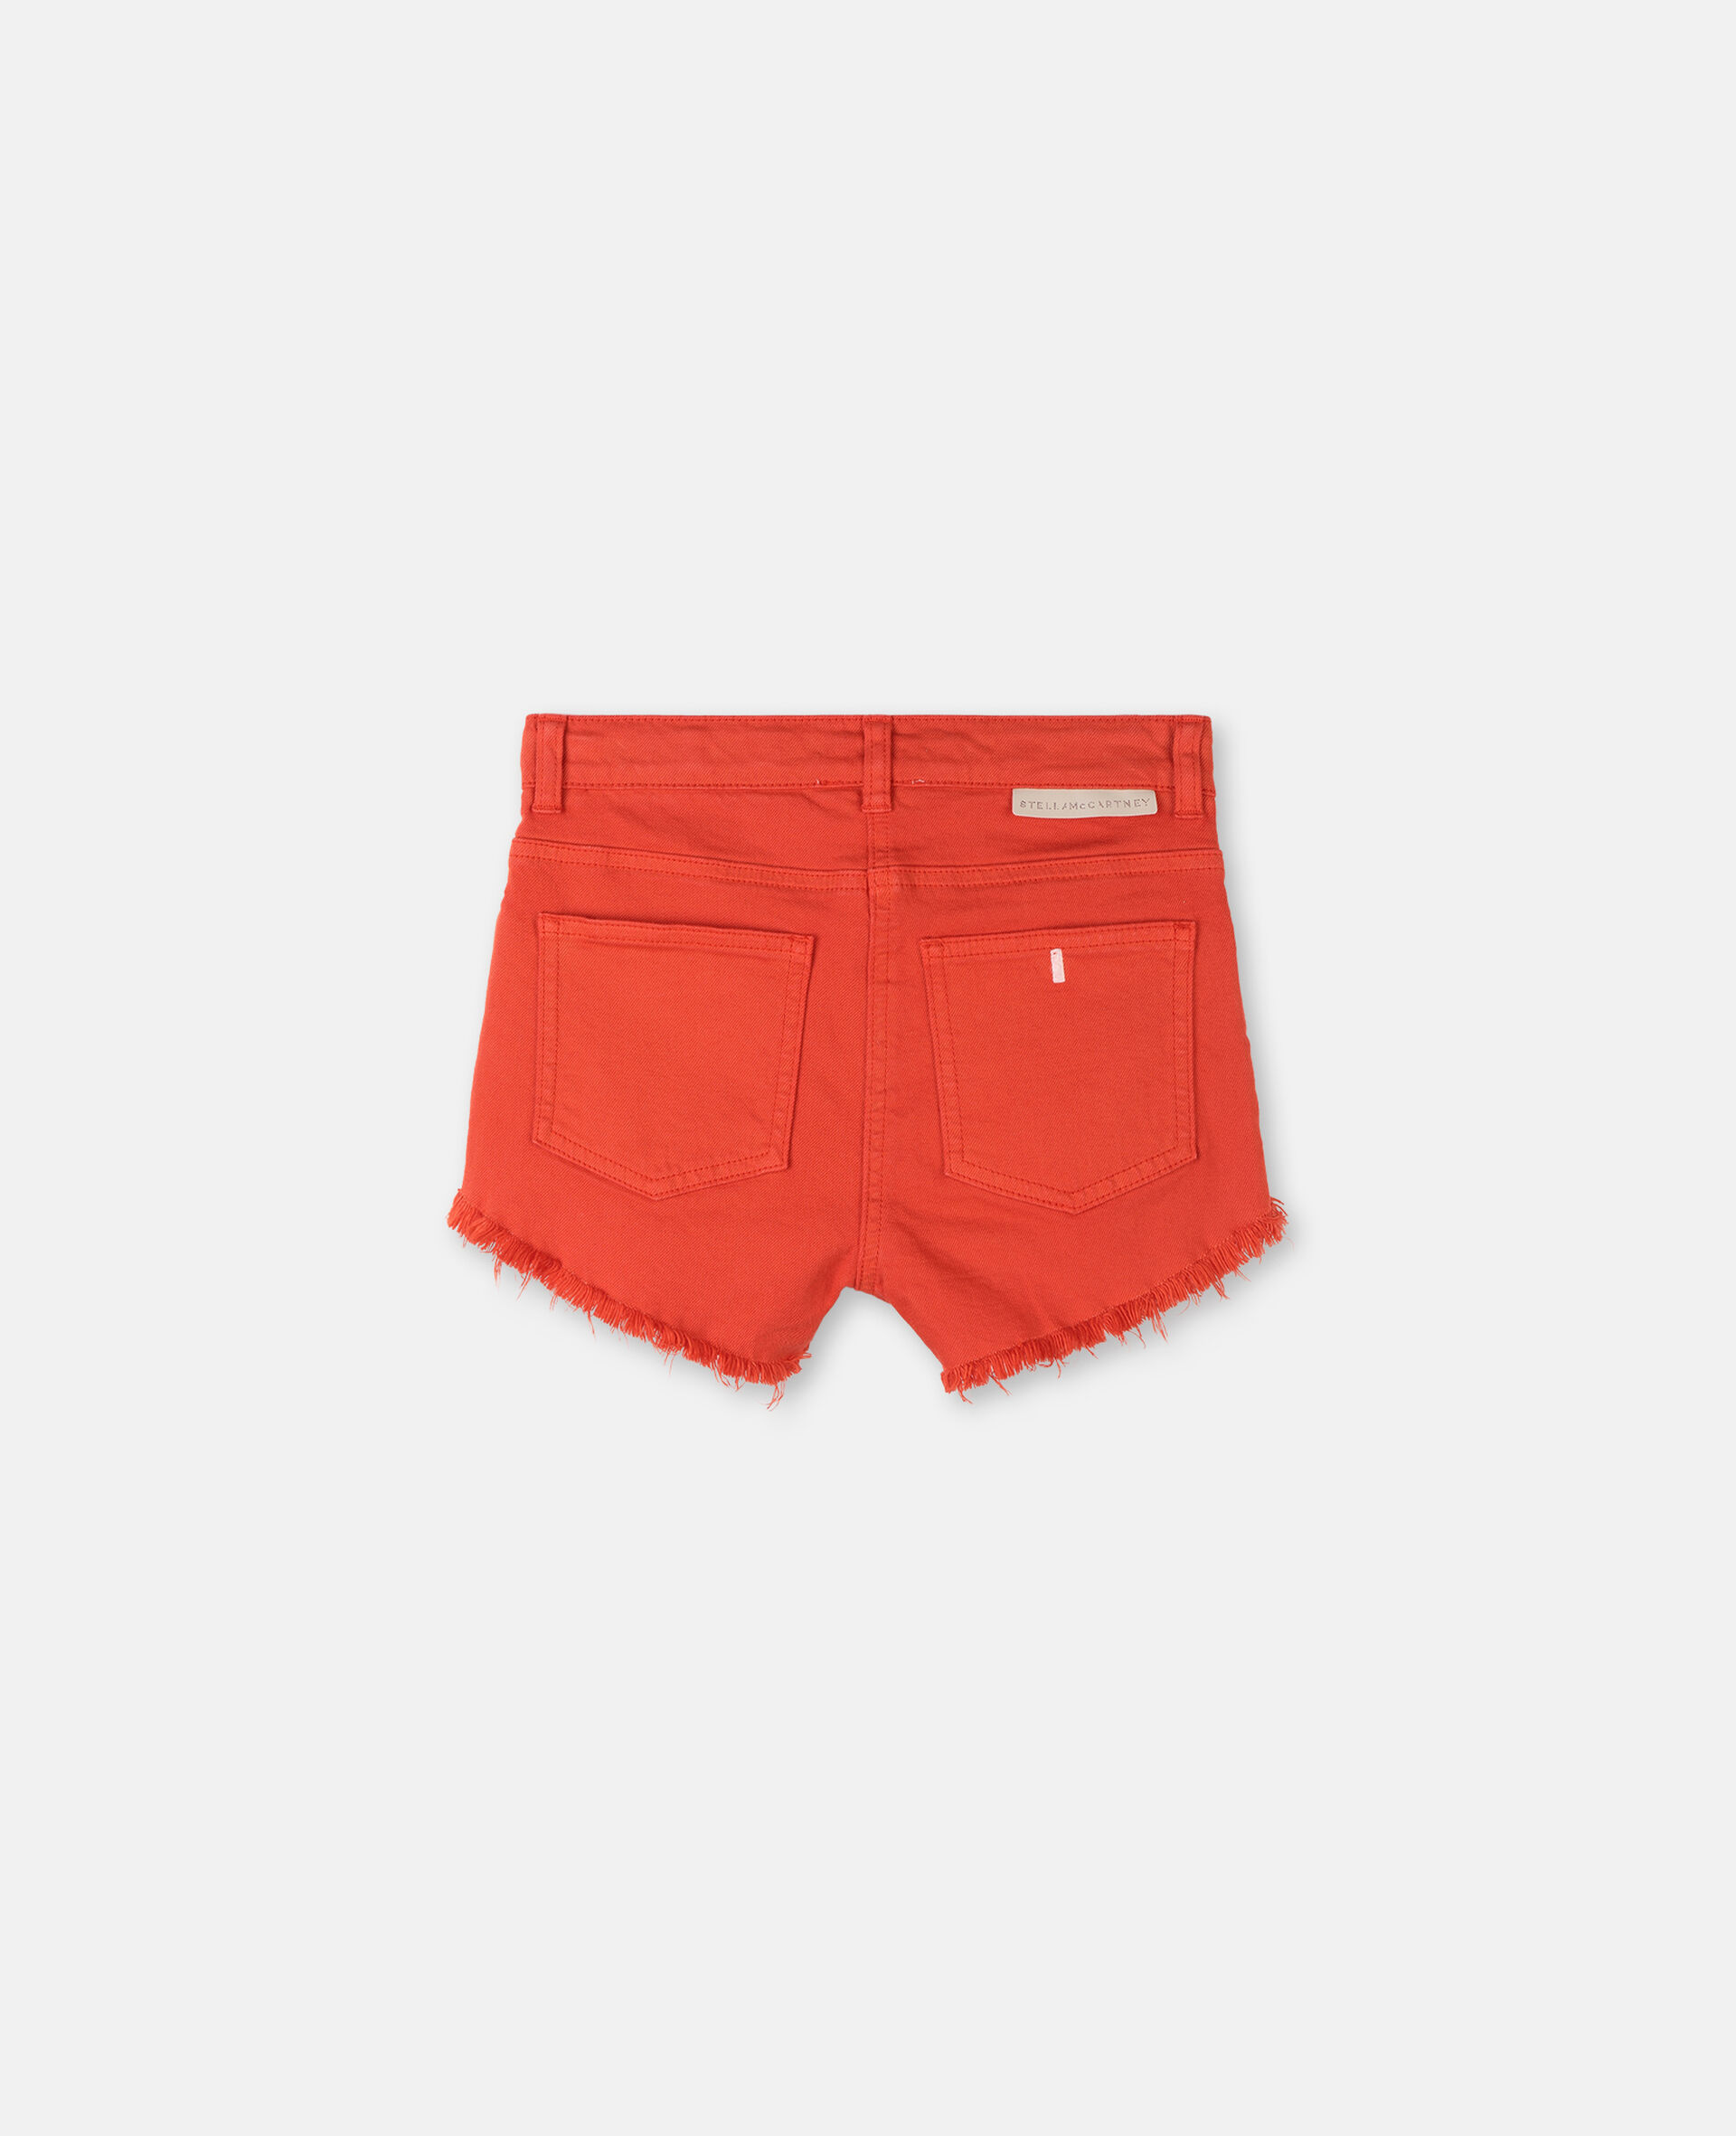 Denim Red Shorts -Red-large image number 3